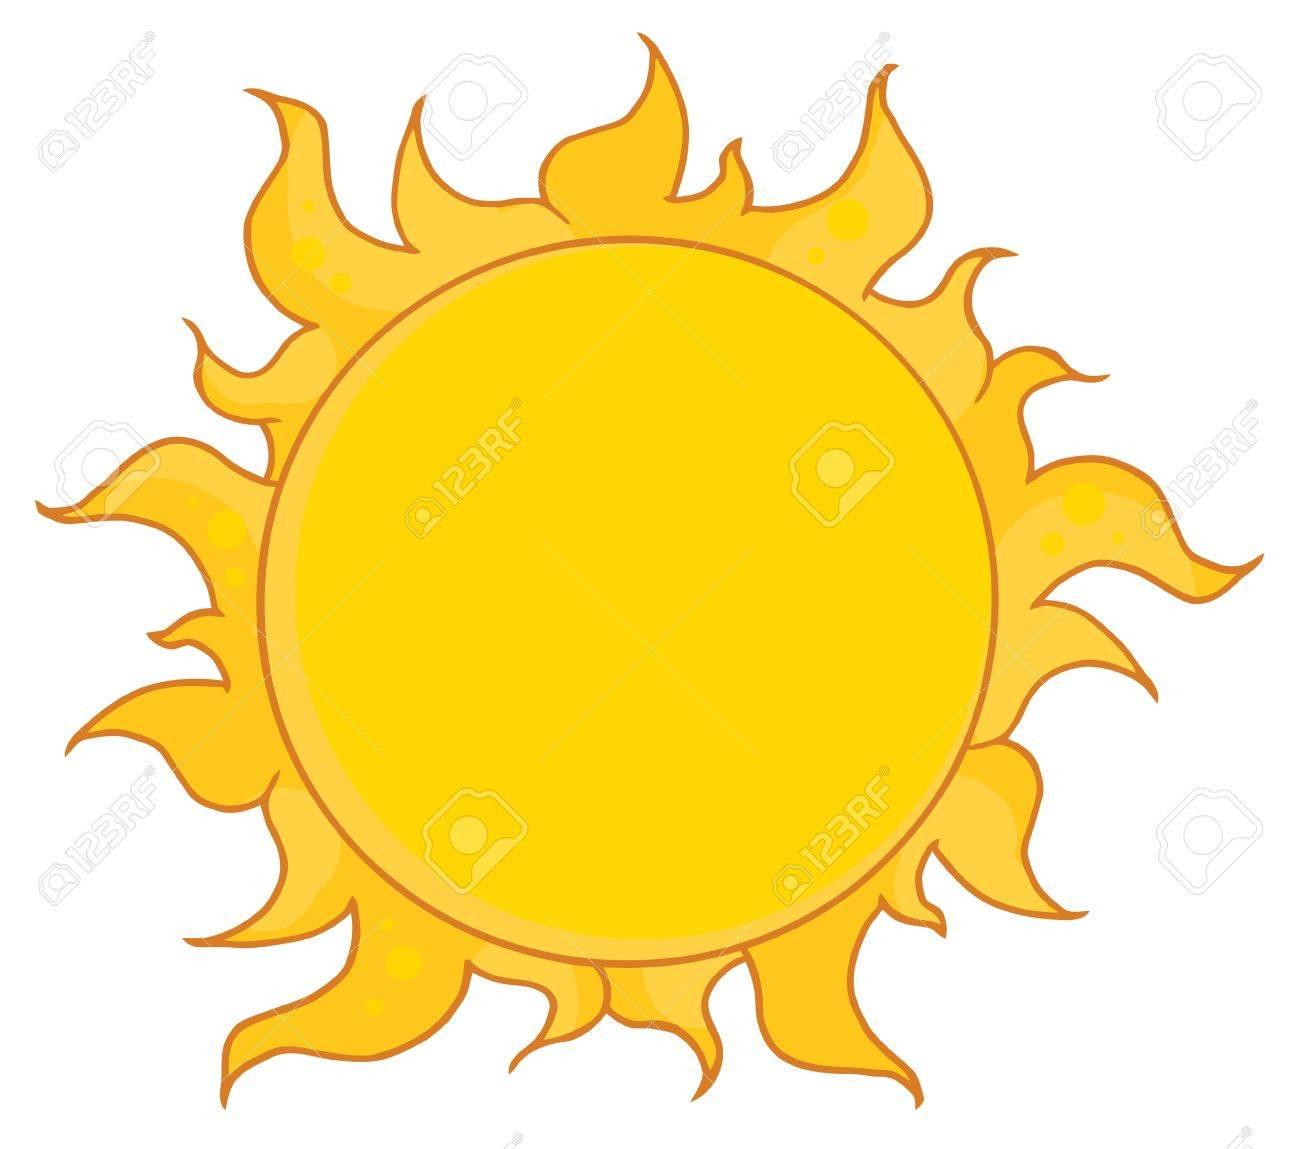 Yellow Sun Shining Stock Vector - 8930270